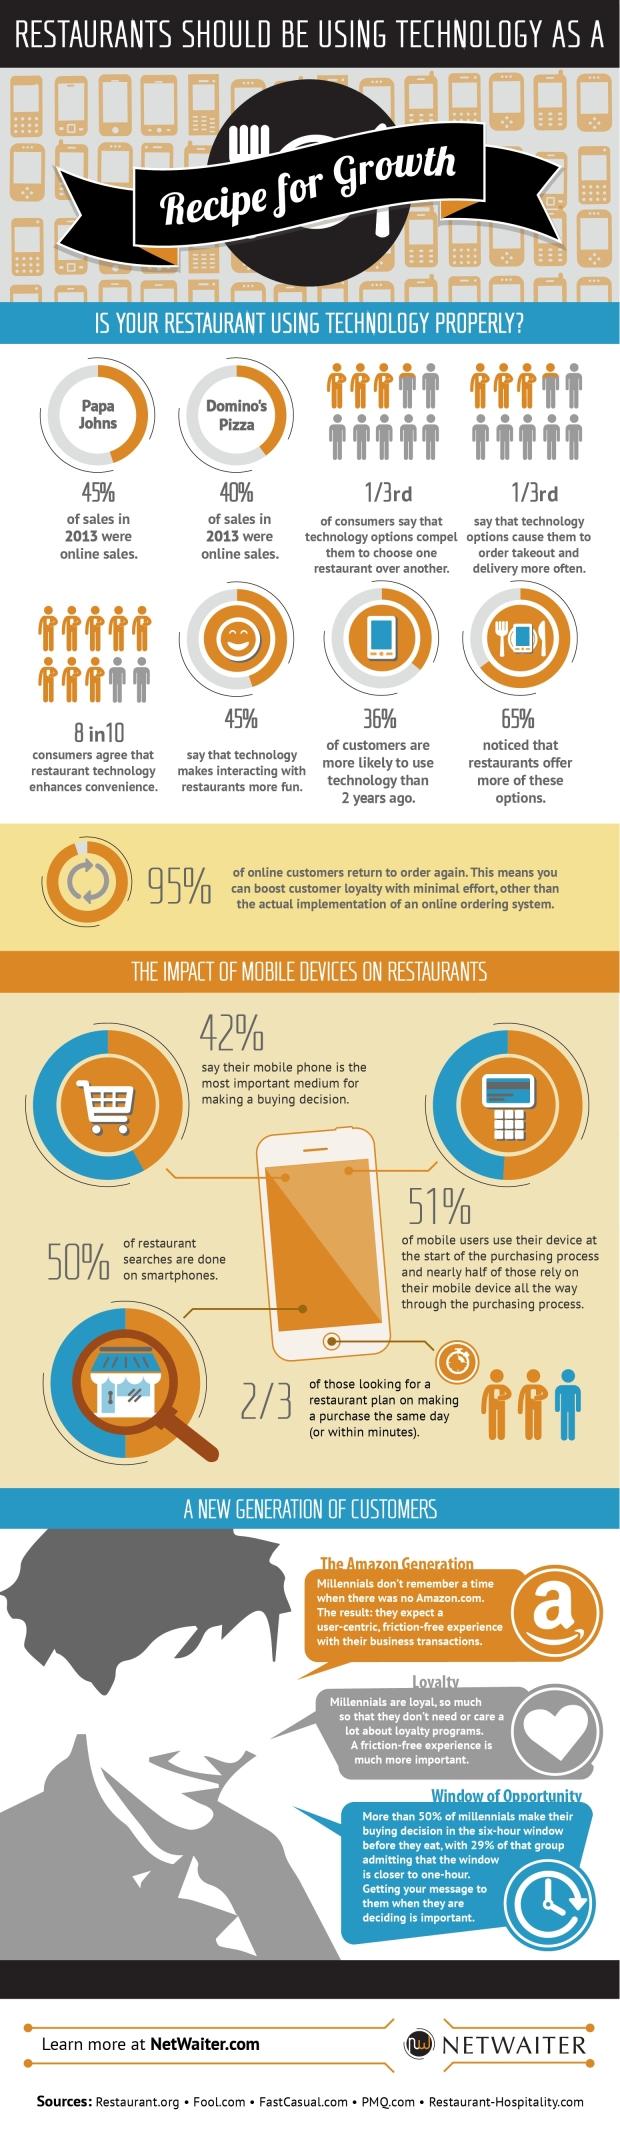 Restaurants should be using technology